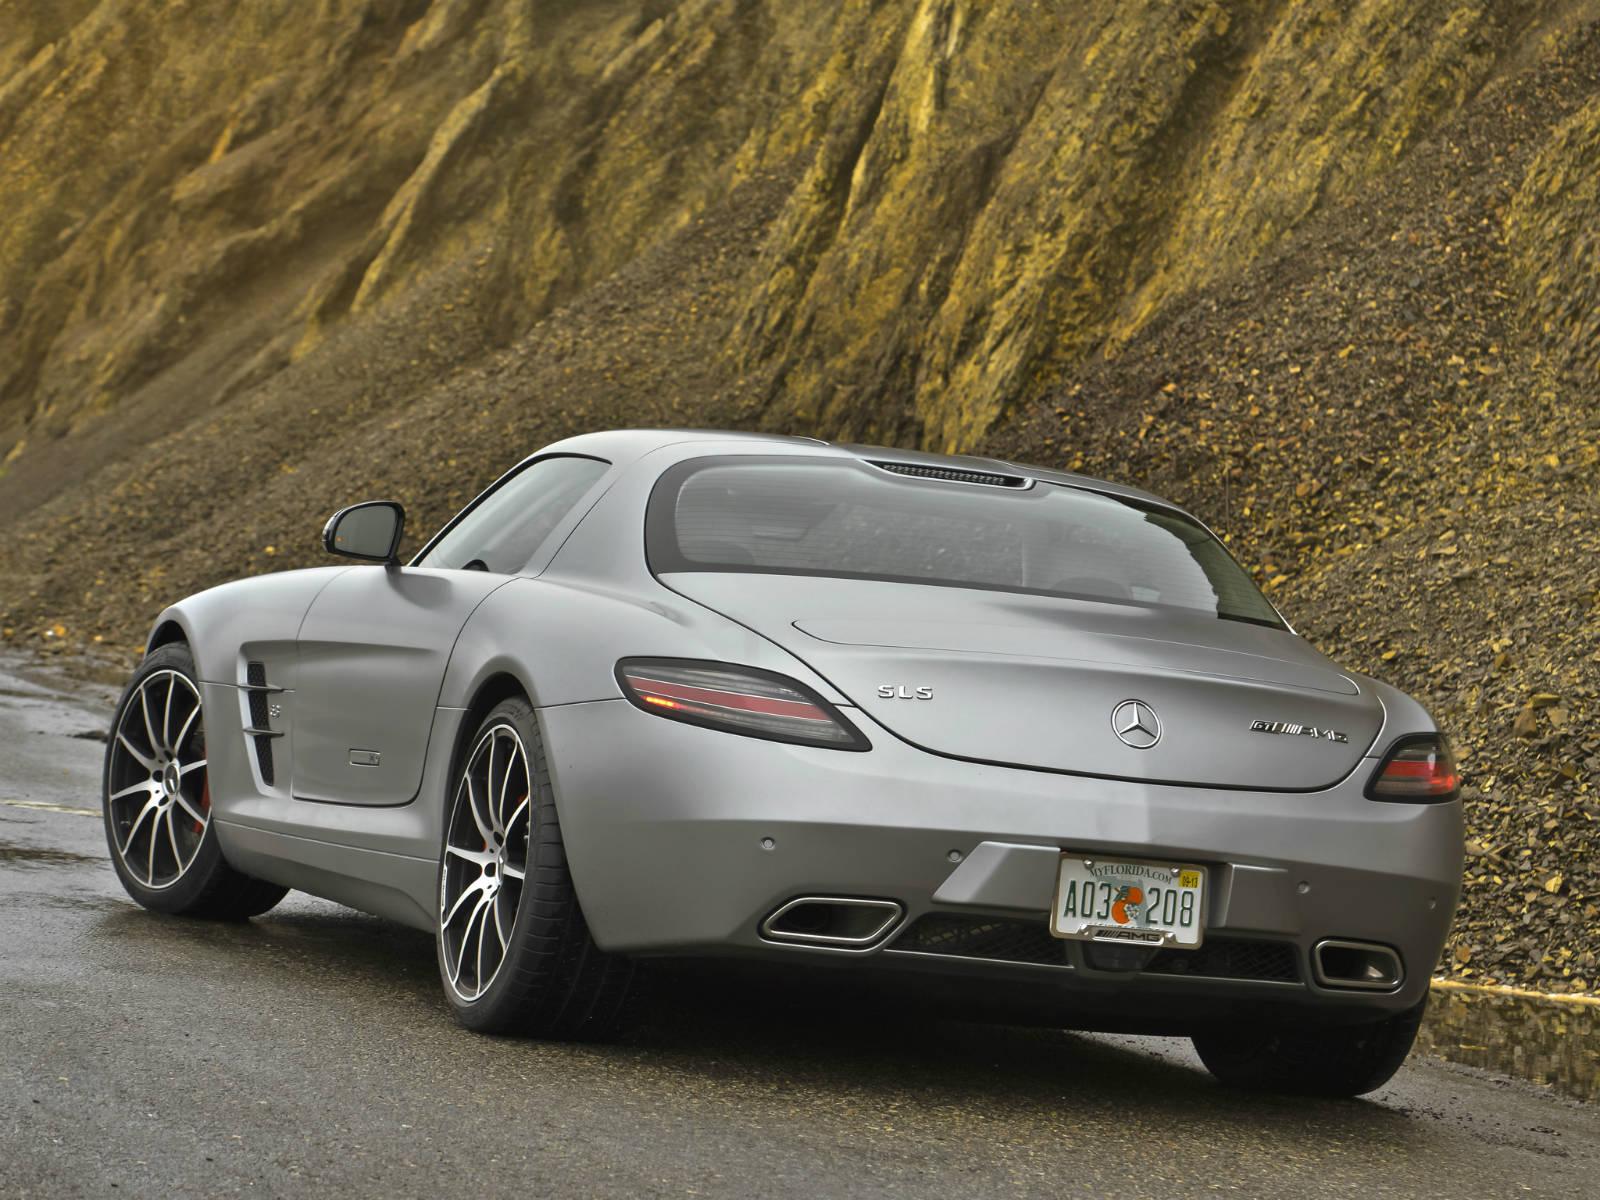 Mercedes sls amg gt coupe matte silver bullet video muscle cars zone - Mercedes sls amg gt coupe ...